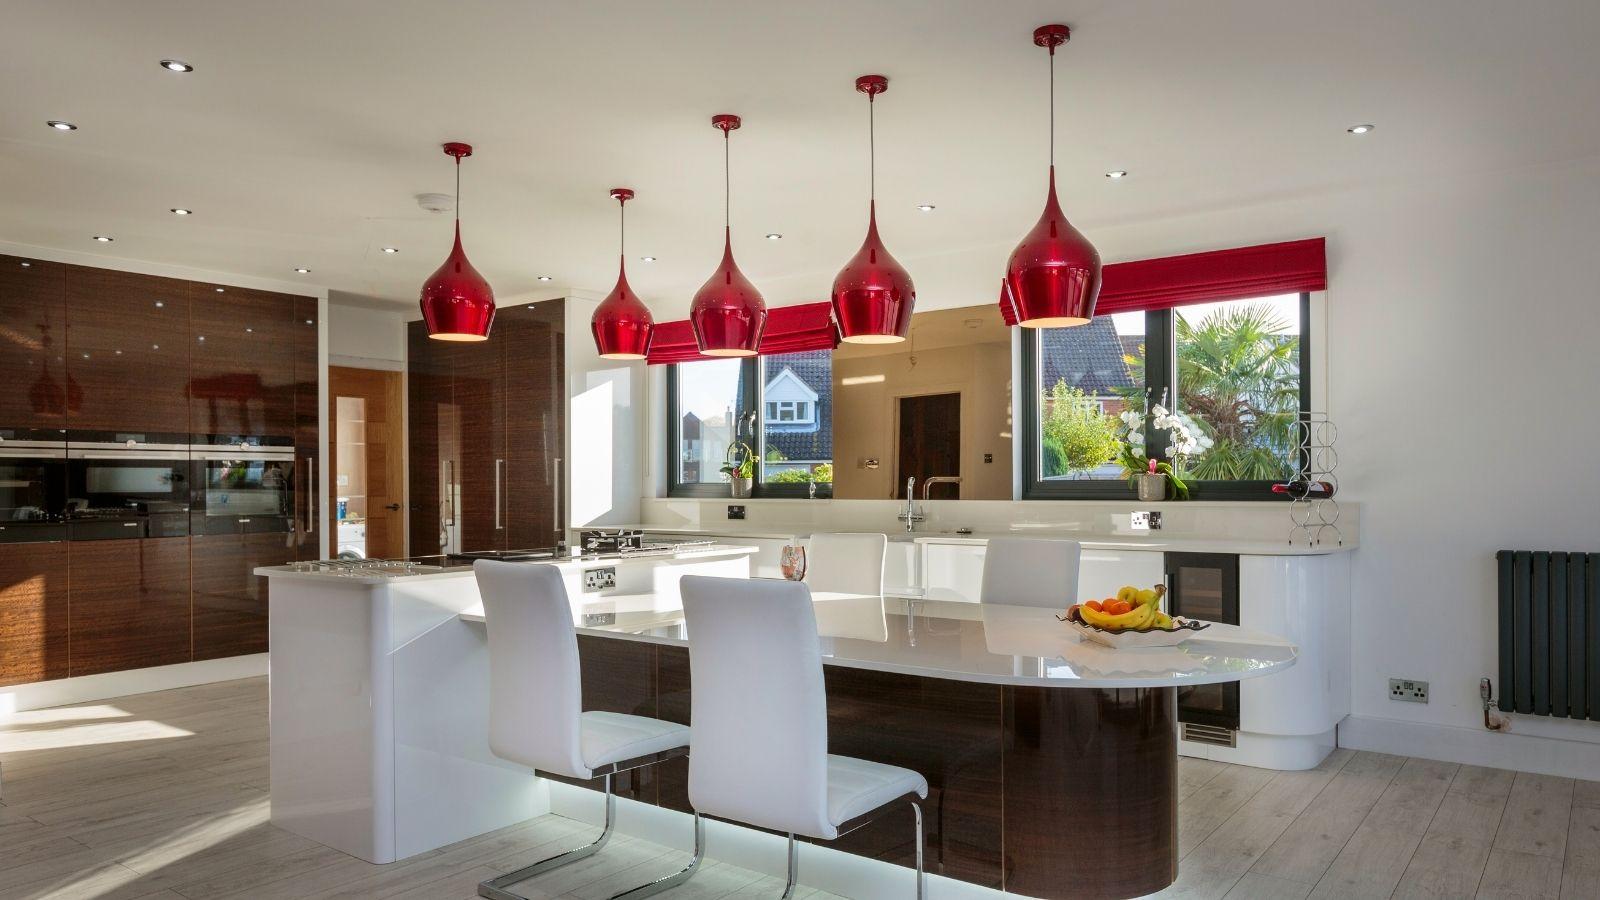 Statement kitchen pendants - Kestrel Kitchens